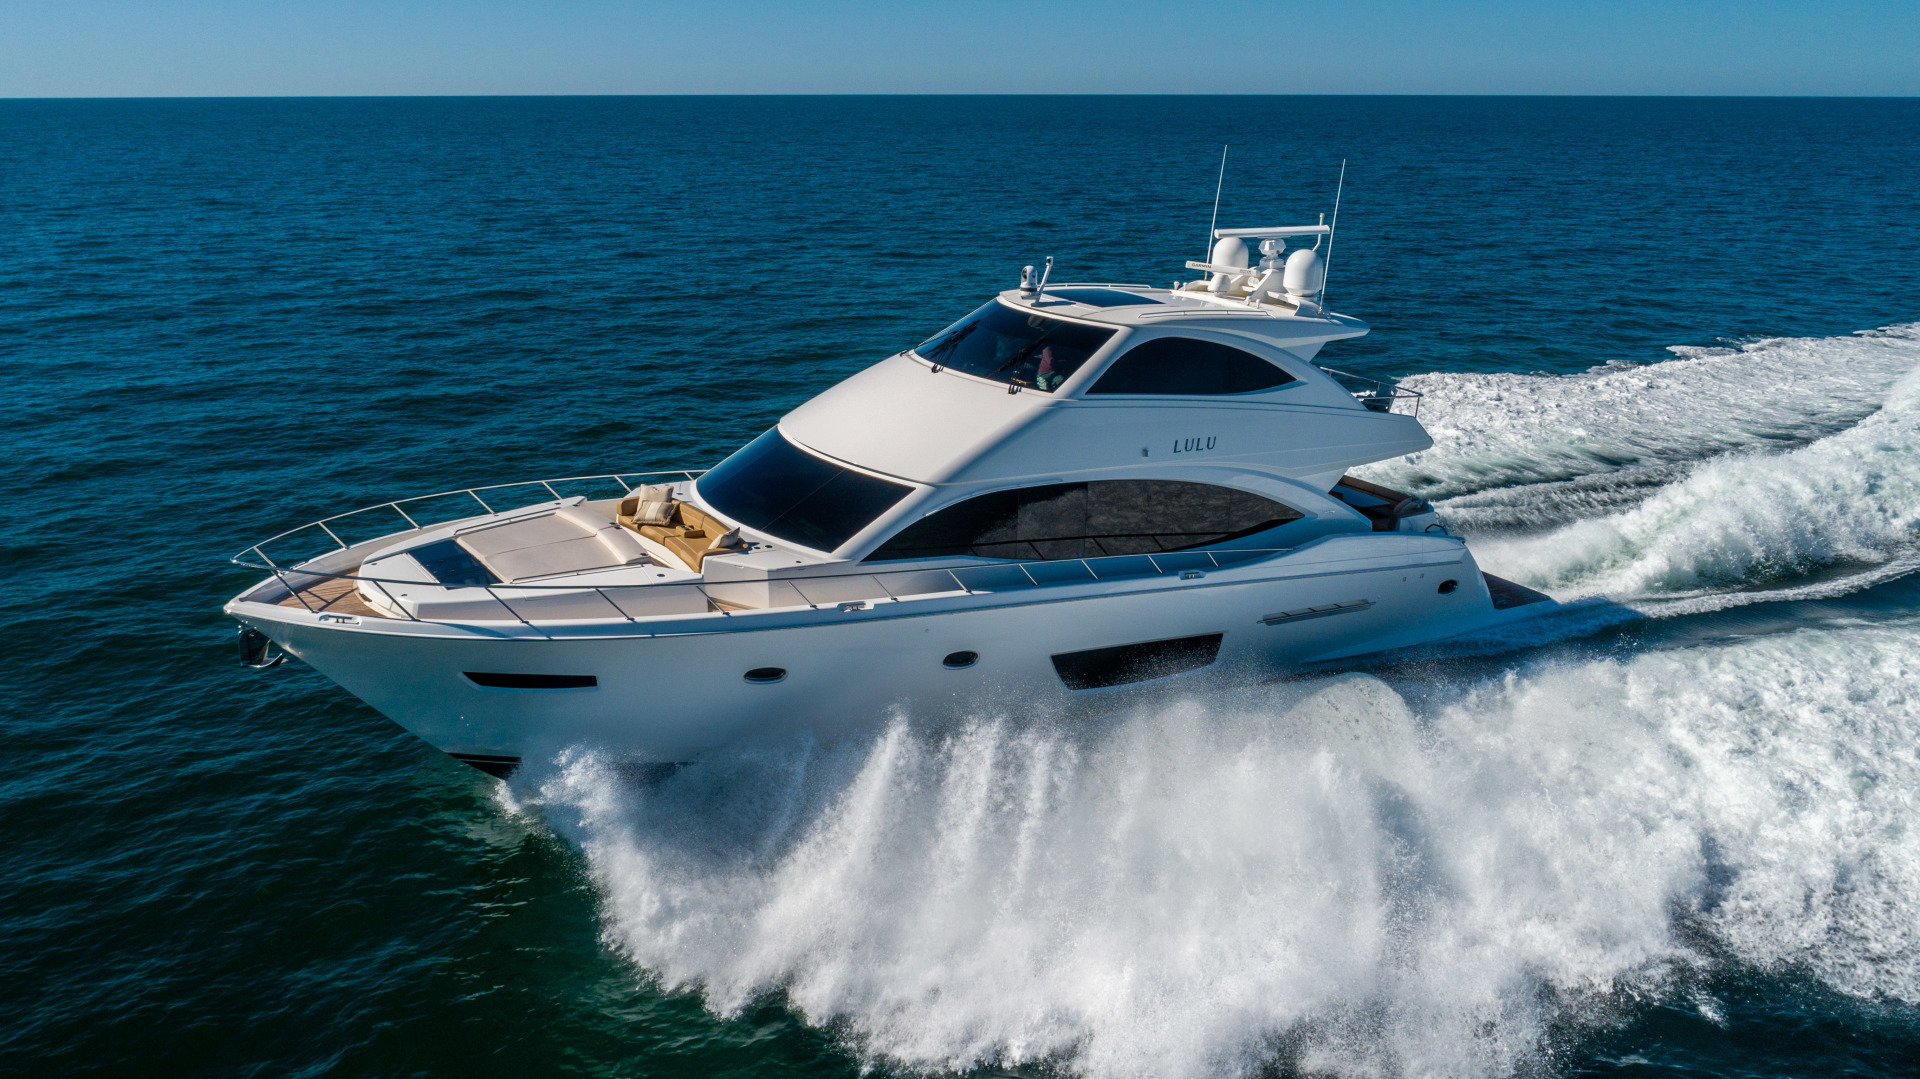 Viking-Motor Yacht 2018-LULU North Palm Beach-Florida-United States-LULU-1405951 | Thumbnail